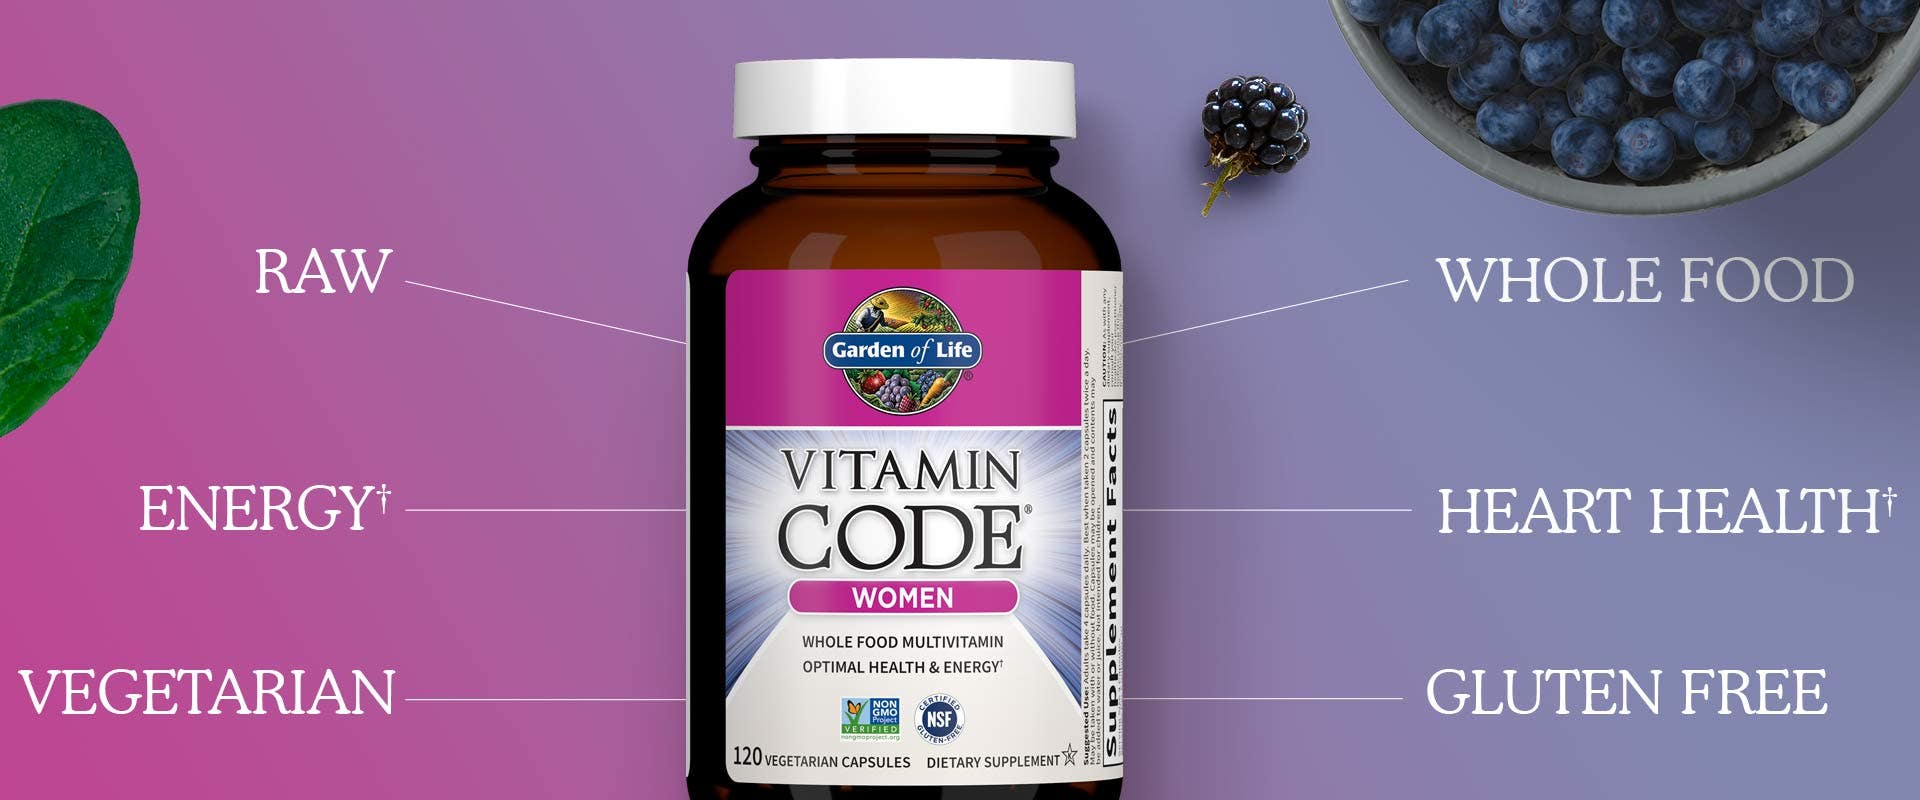 Vitamin Code Women Capsules